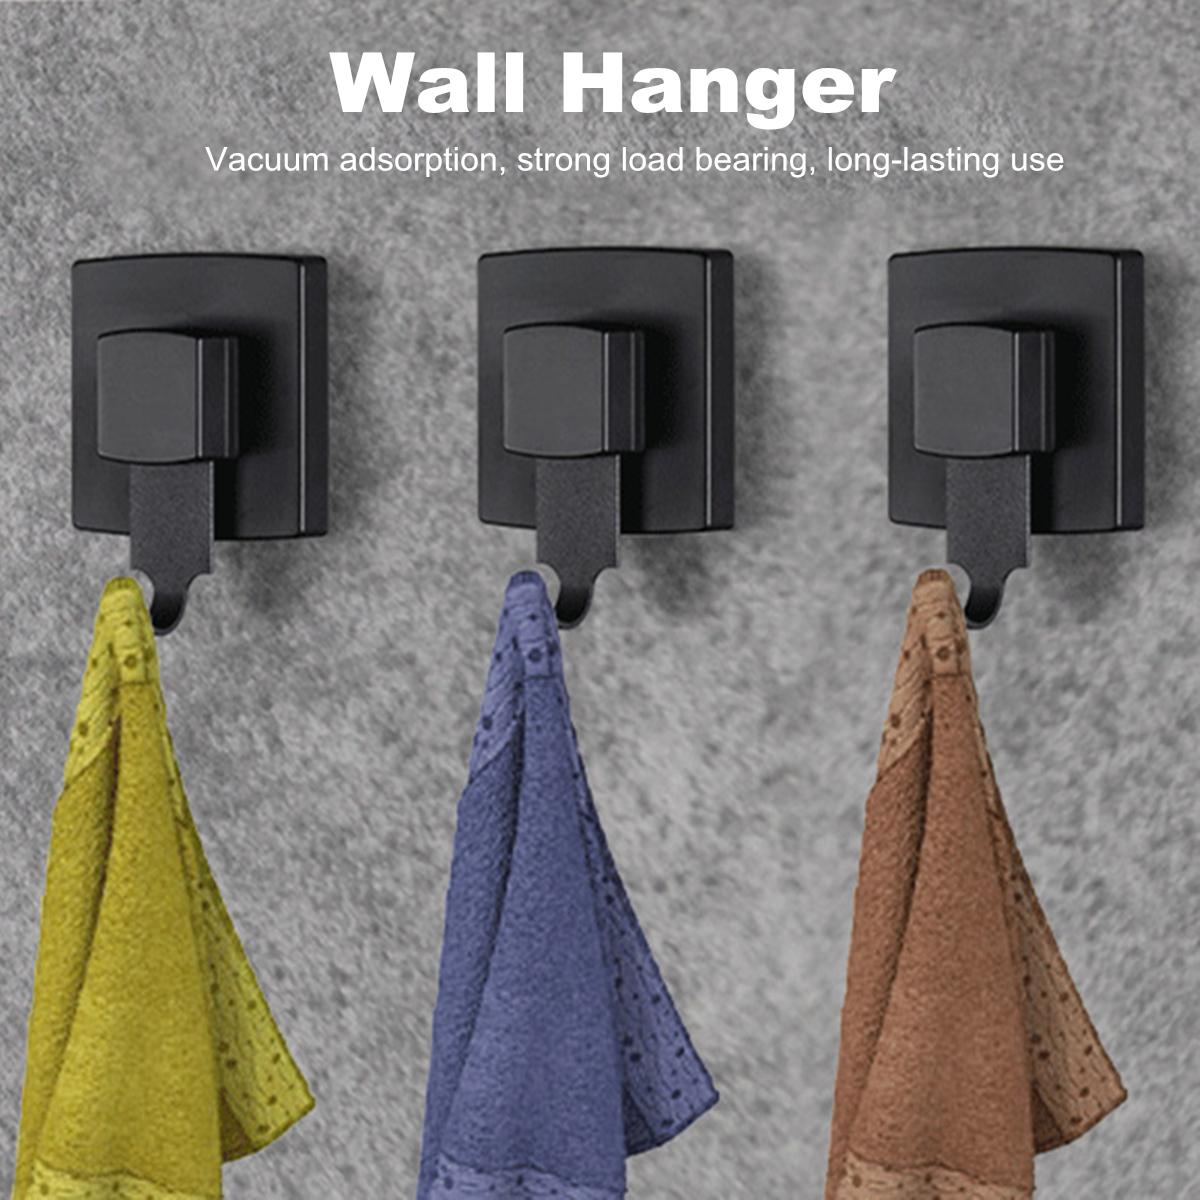 3 Stk Vakuum Saughaken Badezimmer Wand Tür Edelstahl Handtuchhalter